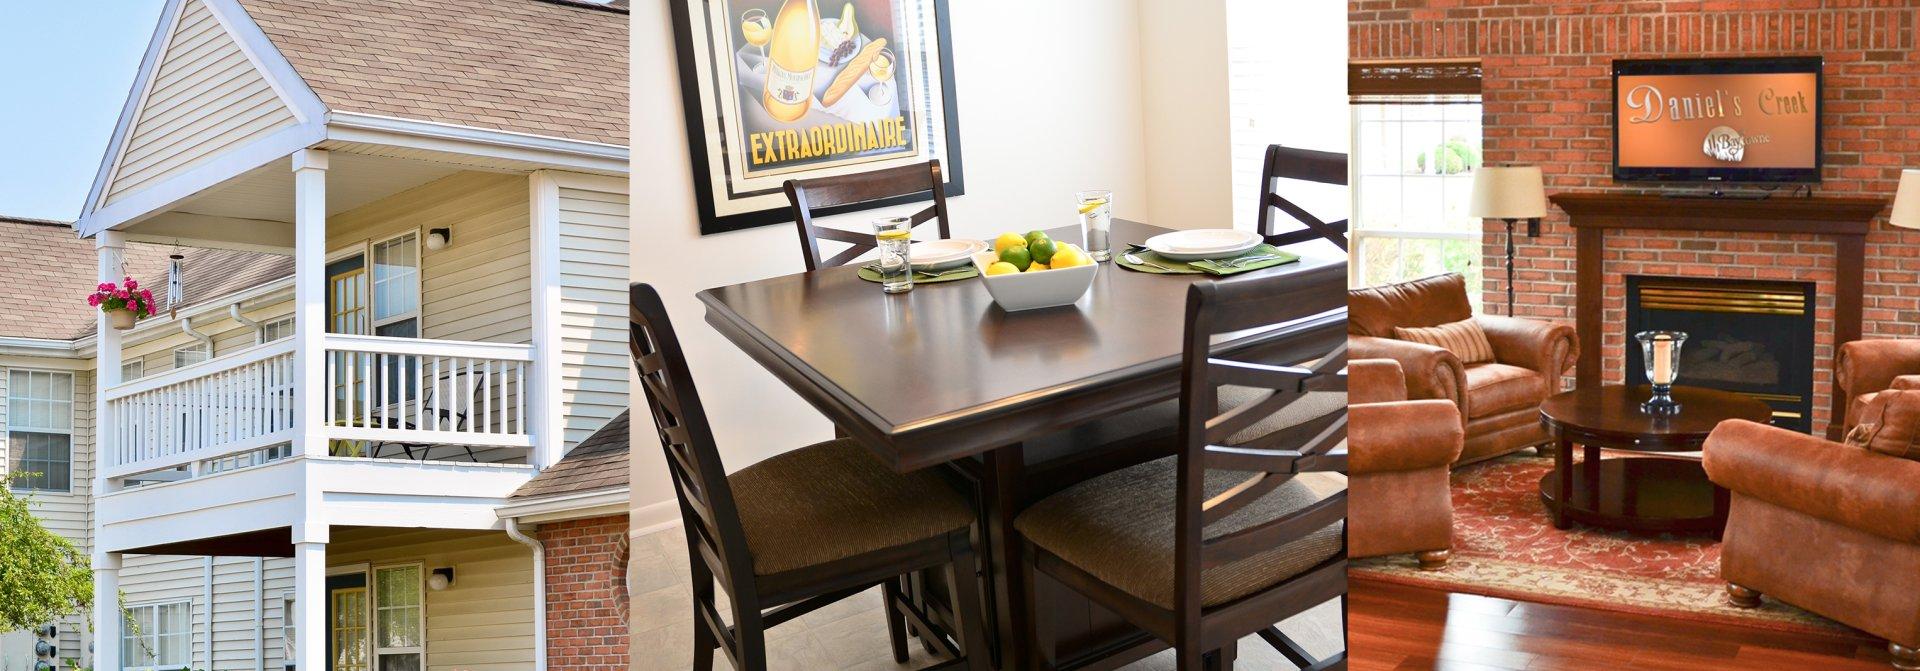 Collage of Daniel's Creek (Exterior, Interior Dinning Table, Interior Living Room)